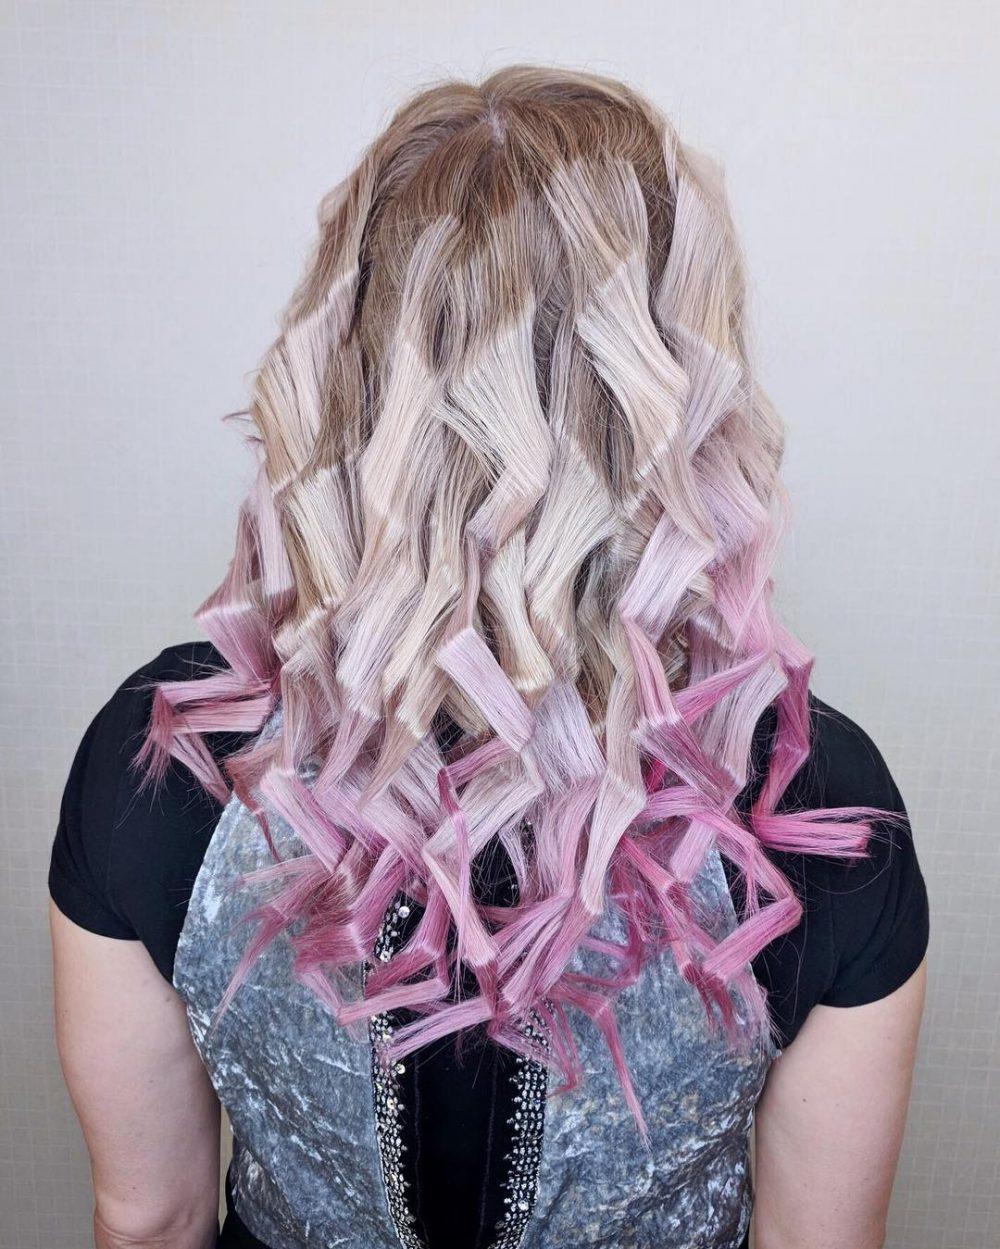 Spunky Alternative Curls hairstyle